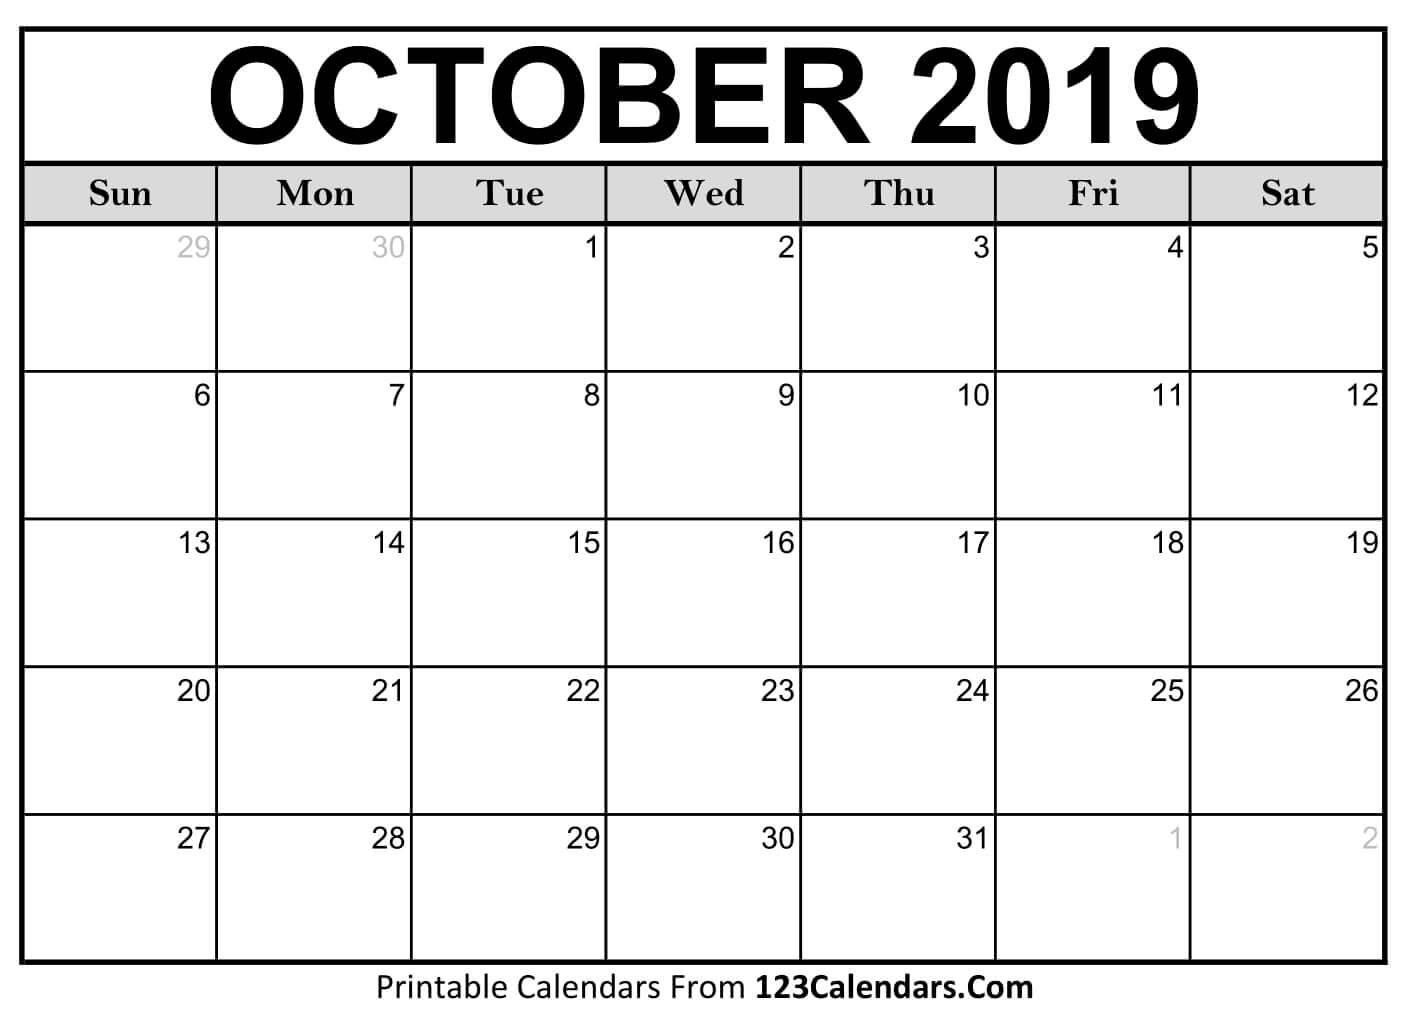 Printable October 2019 Calendar Templates - 123Calendars Calendar 2019 October